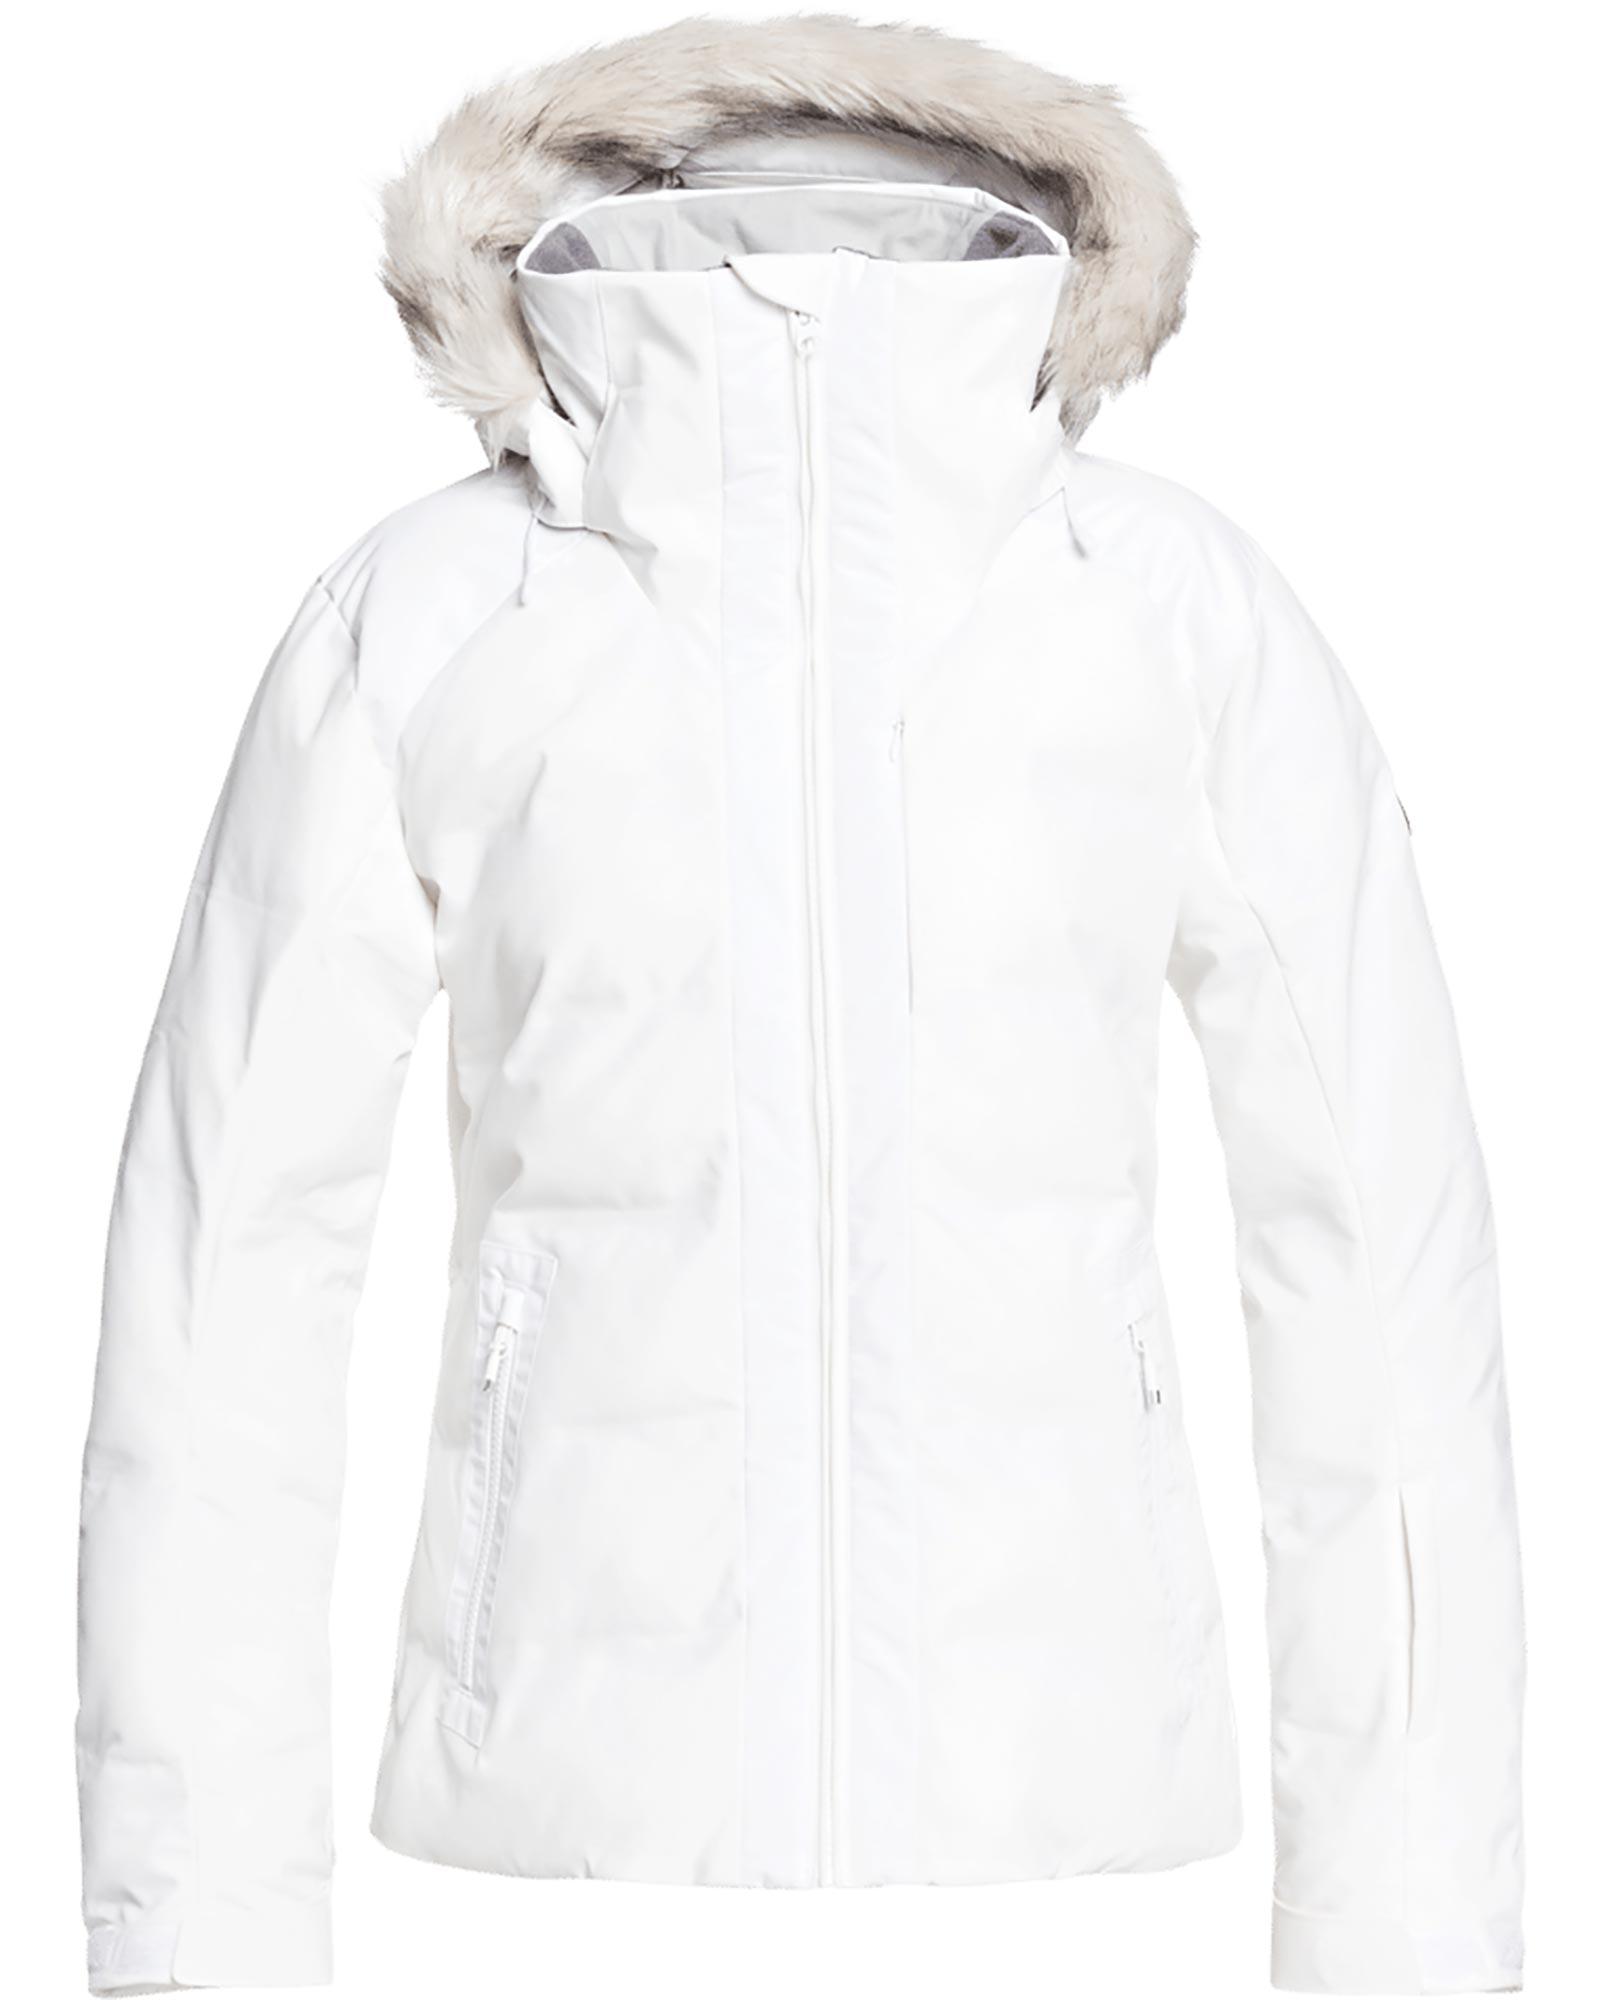 Roxy Girls Valley Hoodie Jacket